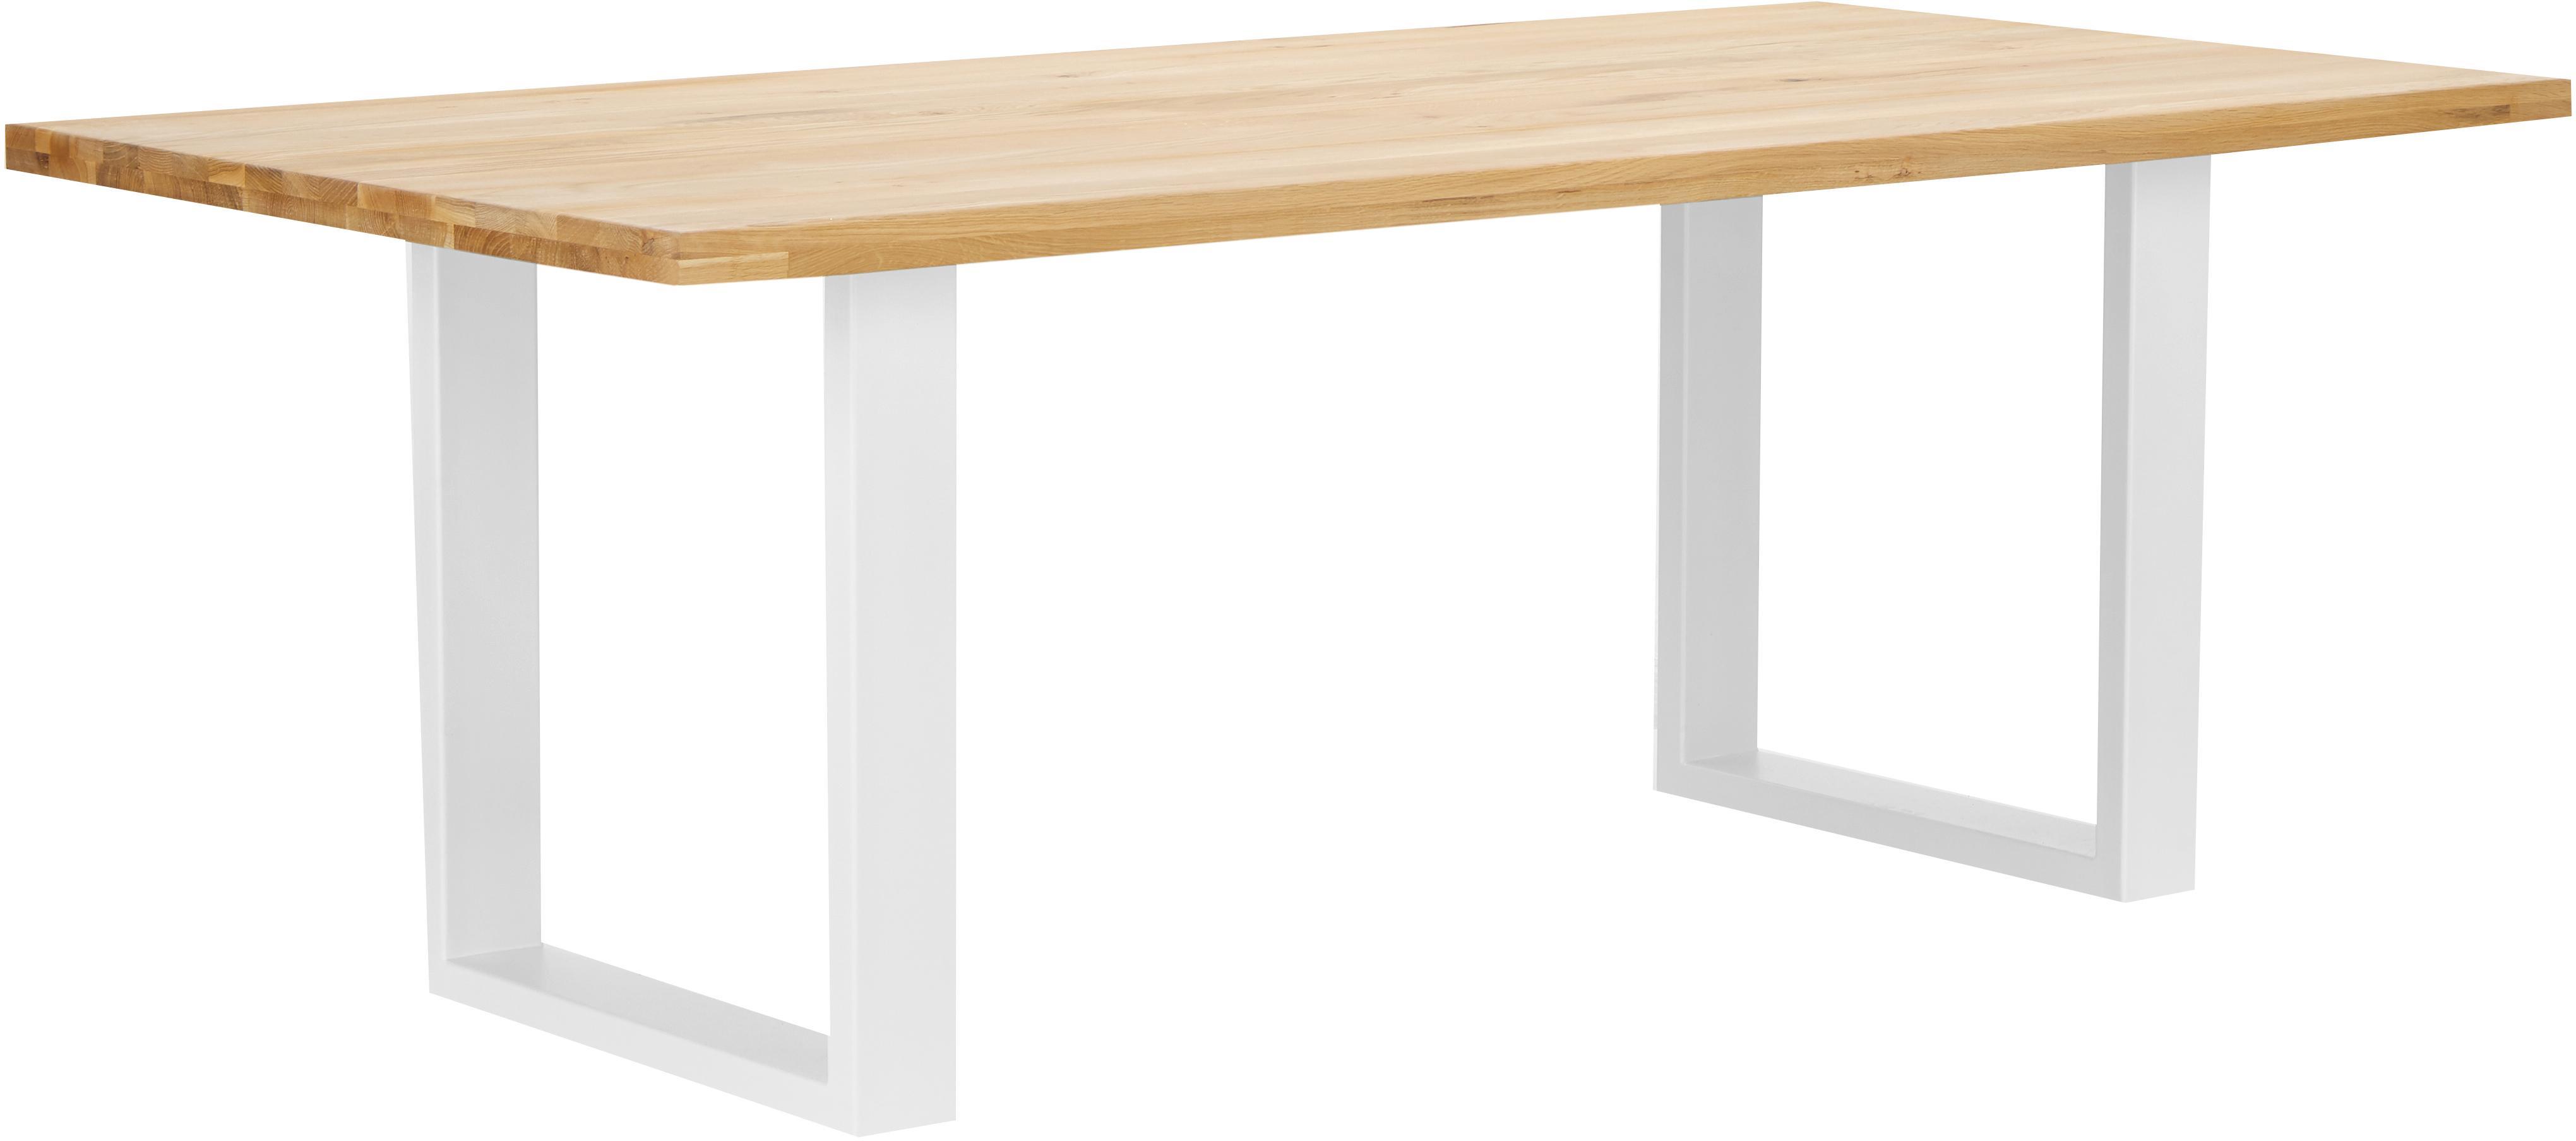 Mesa de comedor Oliver, tablero de madera maciza, Tablero: madera de roble silvestre, Patas: acero mate lacado, Roble, blanco, An 200 x F 100 cm